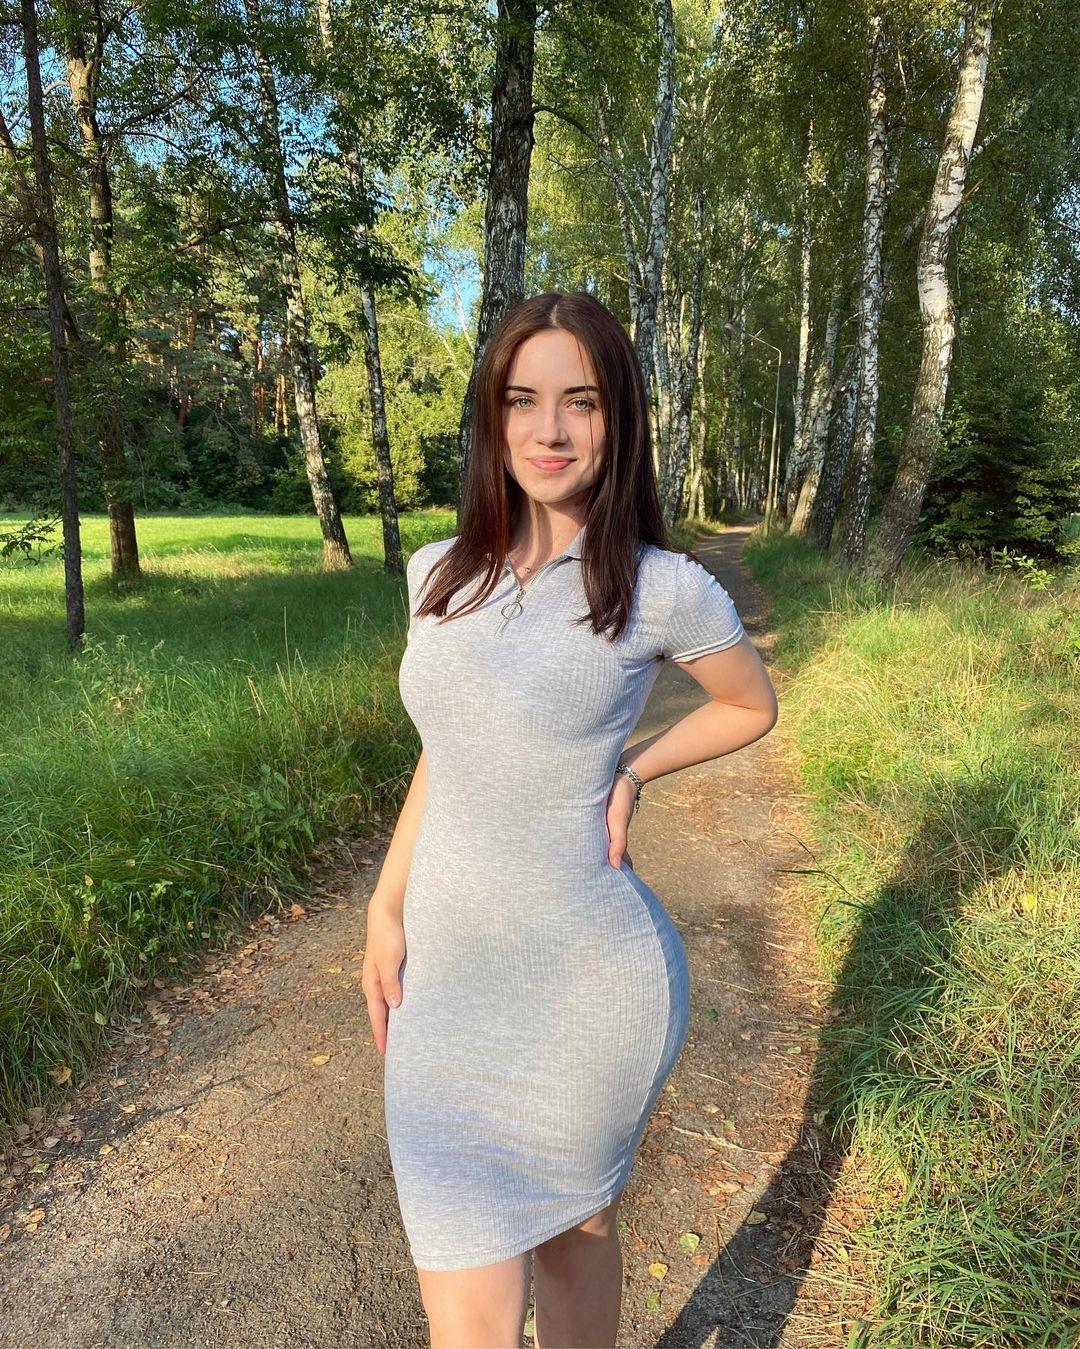 Anya-Desyatnikova-Wallpapers-Insta-Fit-Bio-10